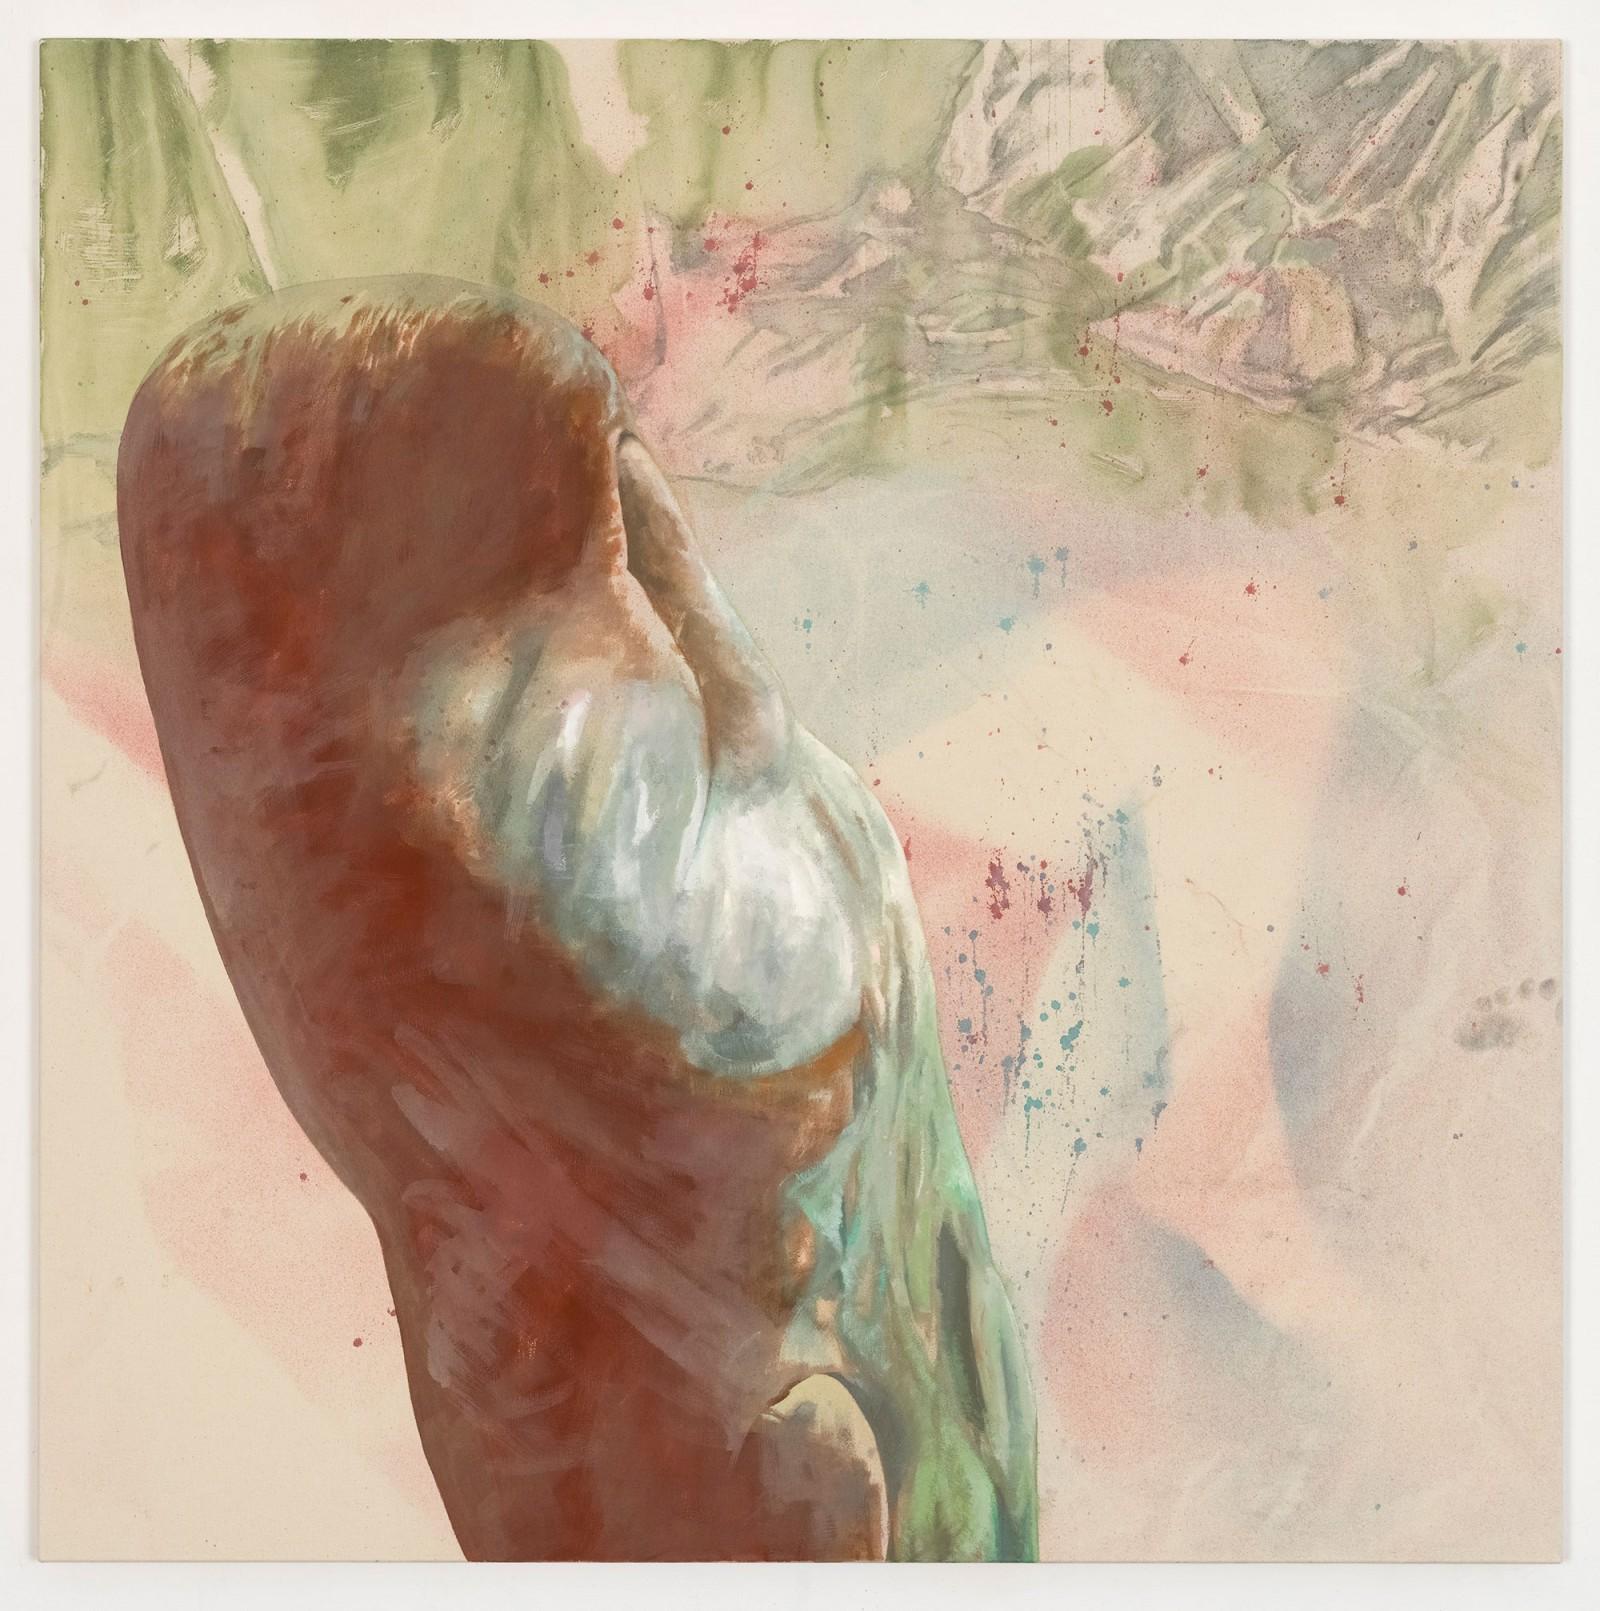 Kim Nekarda: untitled, 2018, vinyl color, oil colour & body print on cotton, 130 x 130 cm